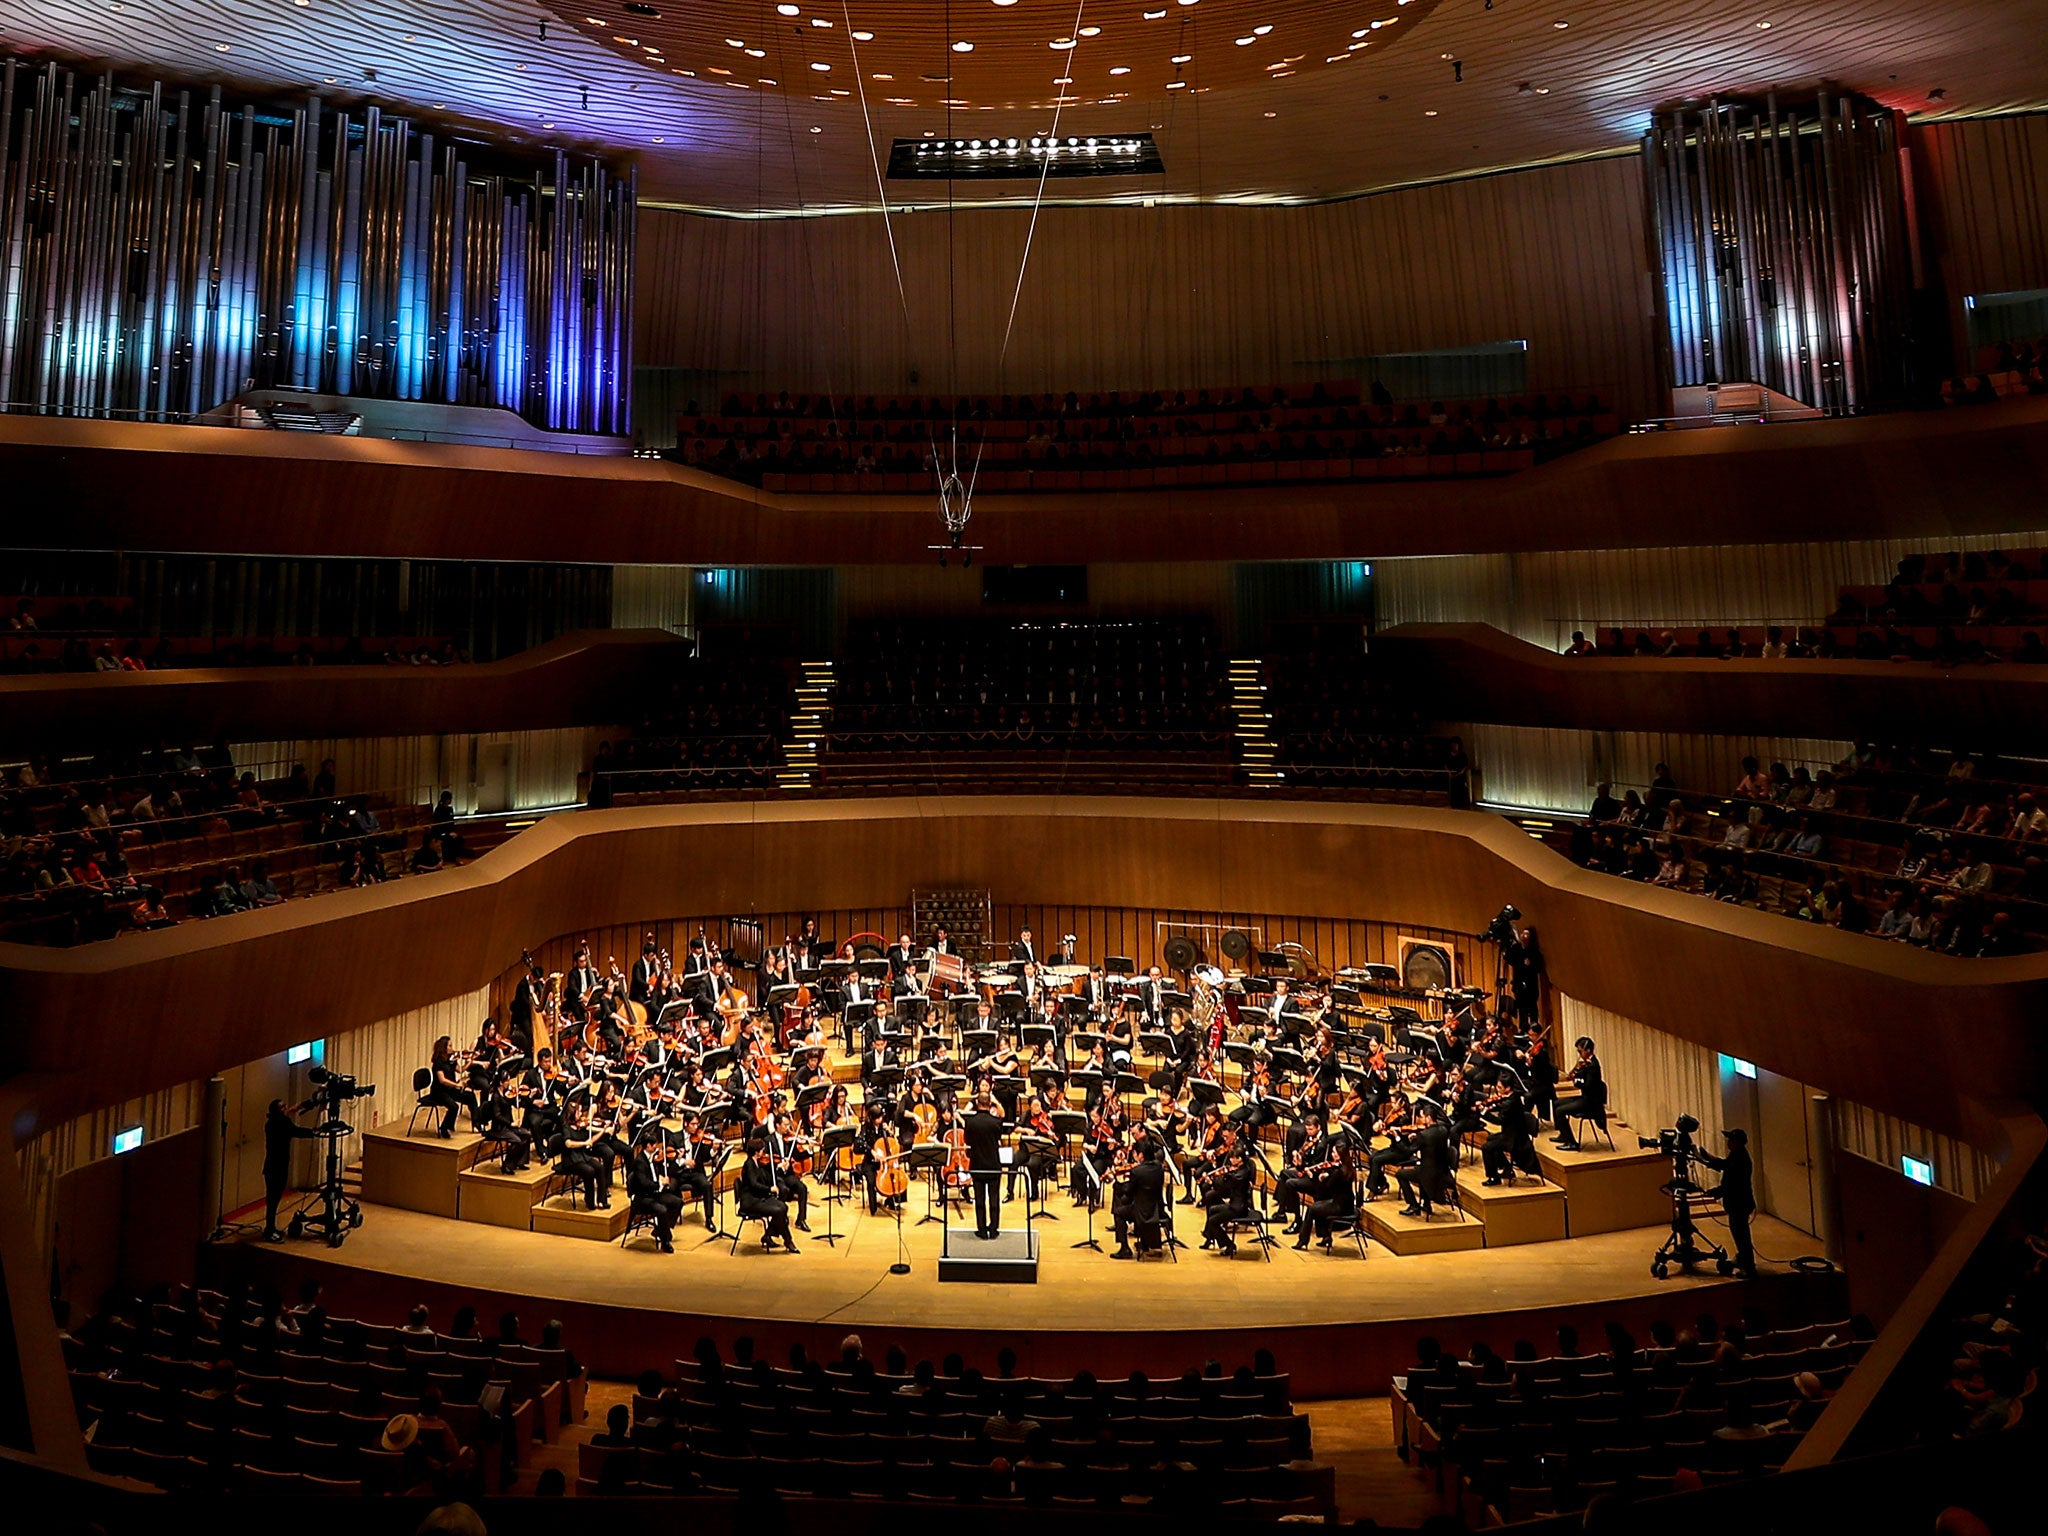 New Brunswick Classical Concerts 2019. New Brunswick, NJ ...